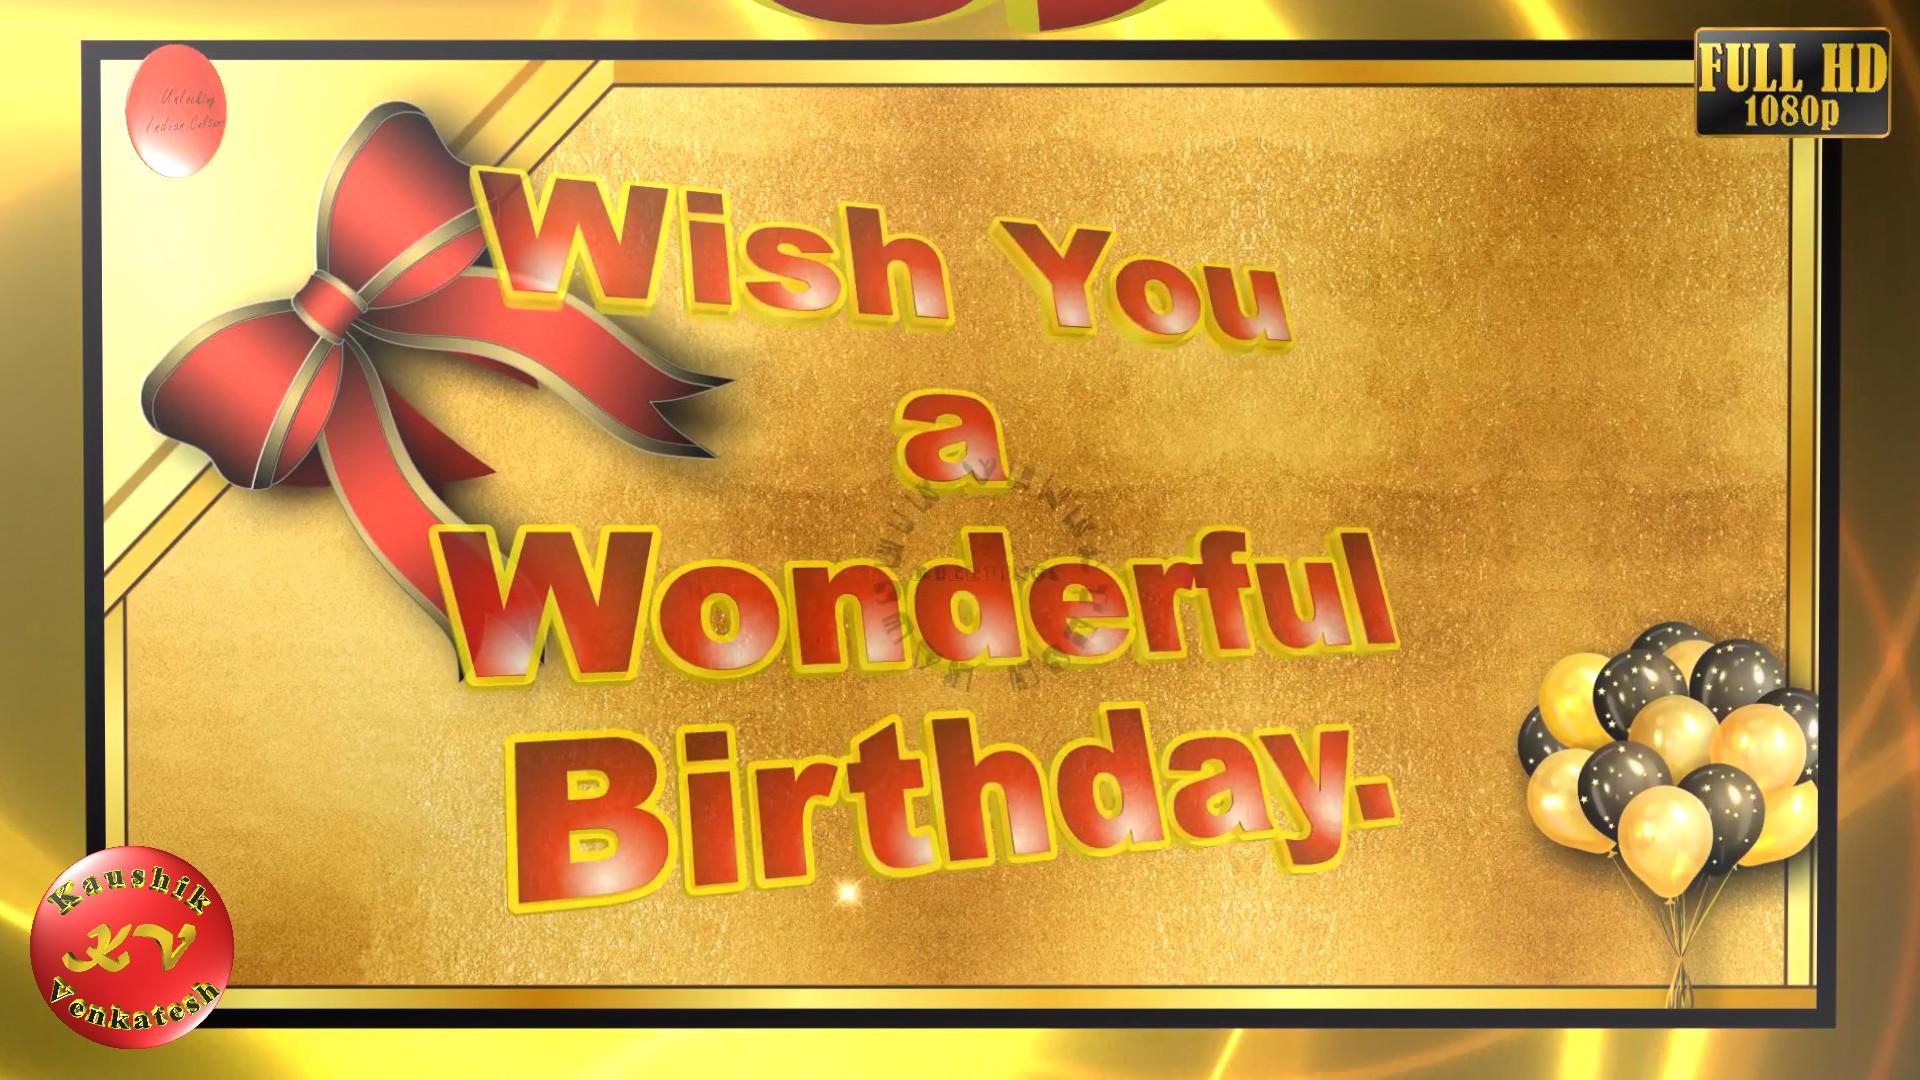 Greetings Image for Birthday celebration